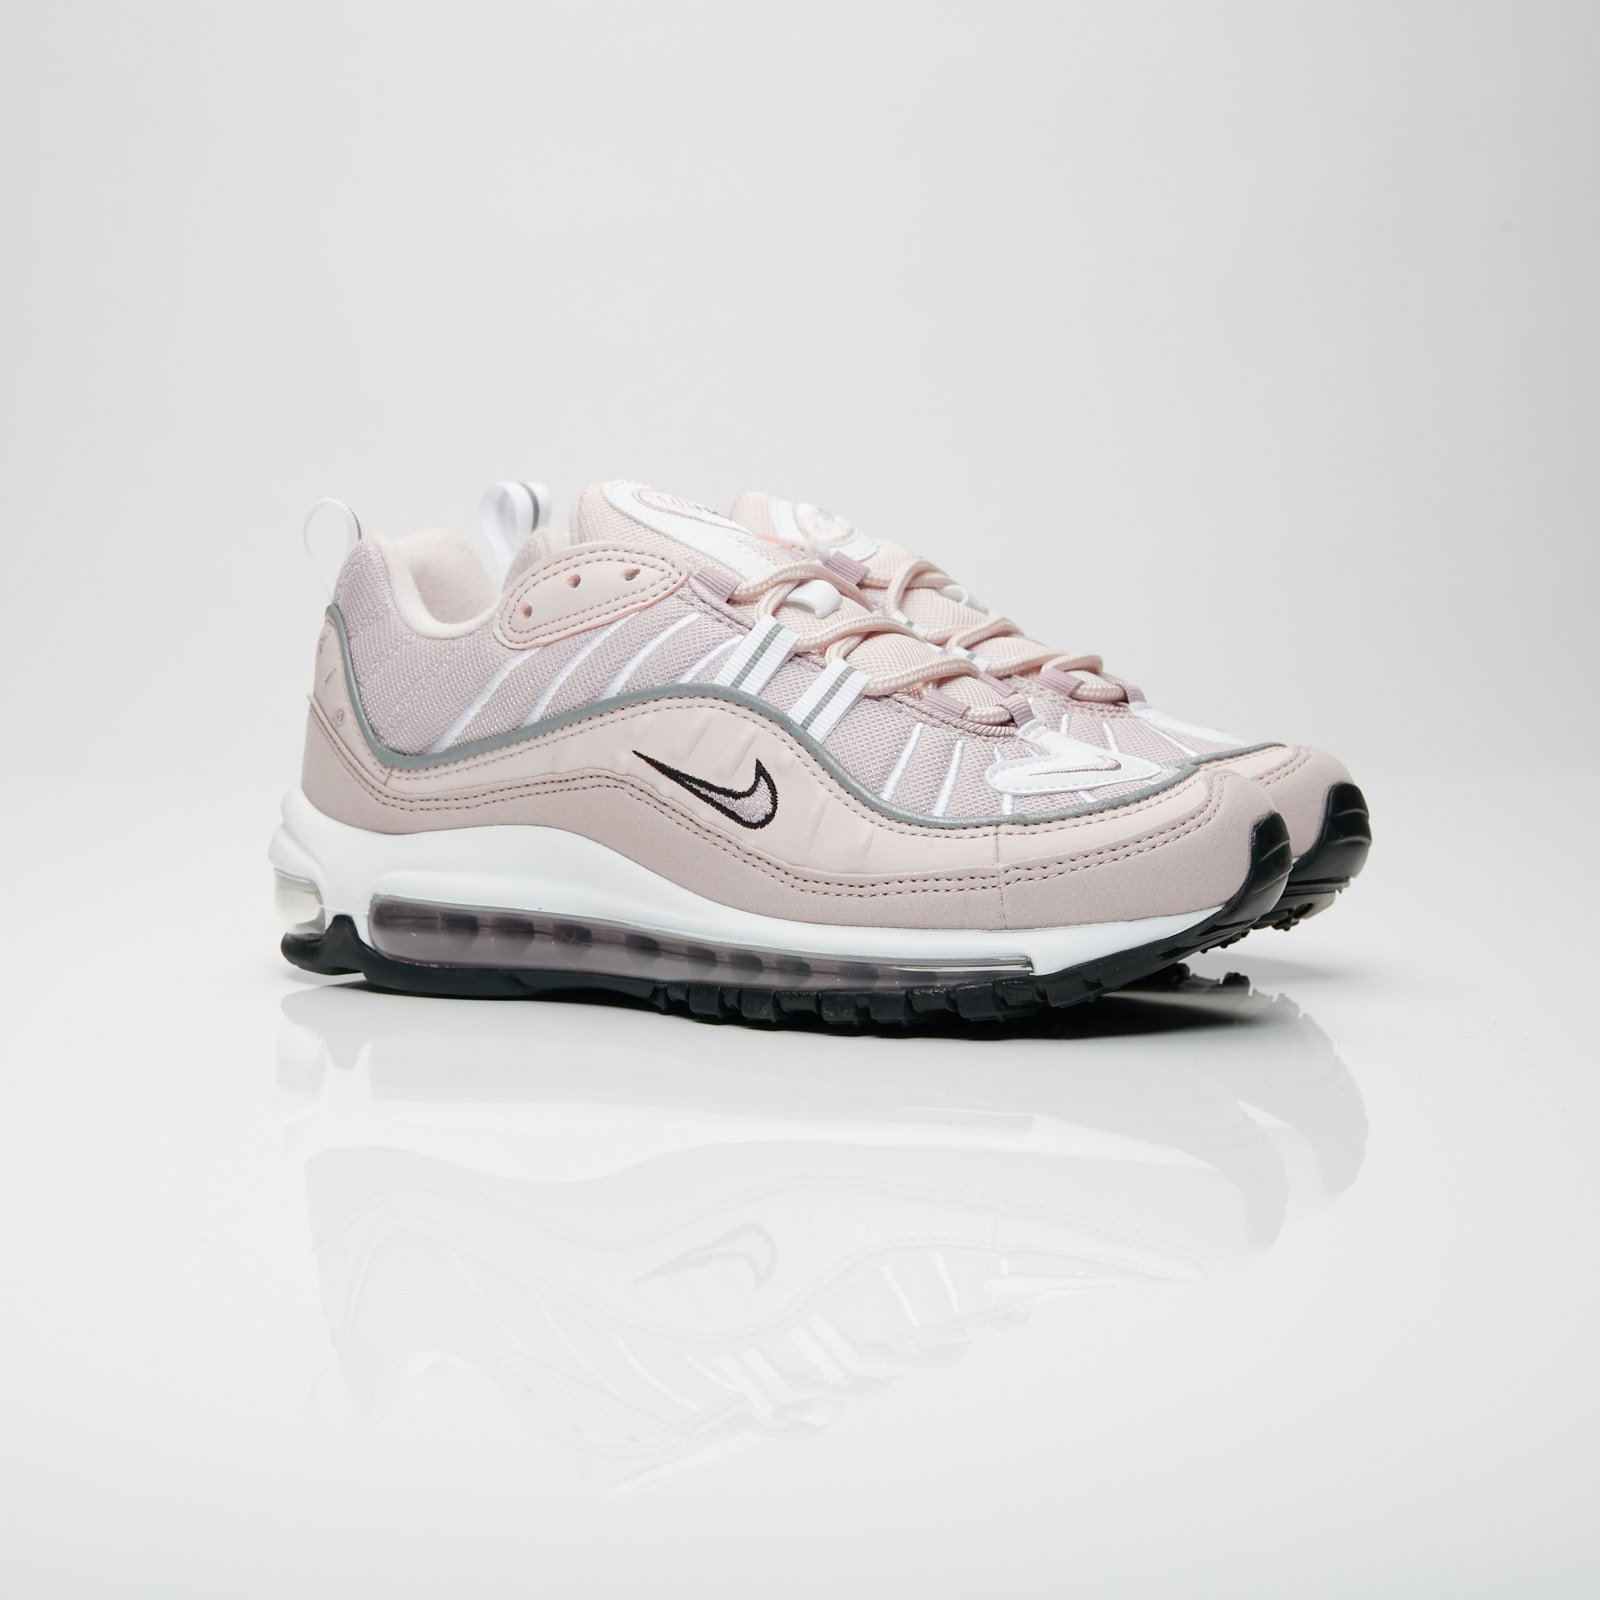 7dc8adc626d1 Nike Wmns Air Max 98 - Ah6799-600 - Sneakersnstuff